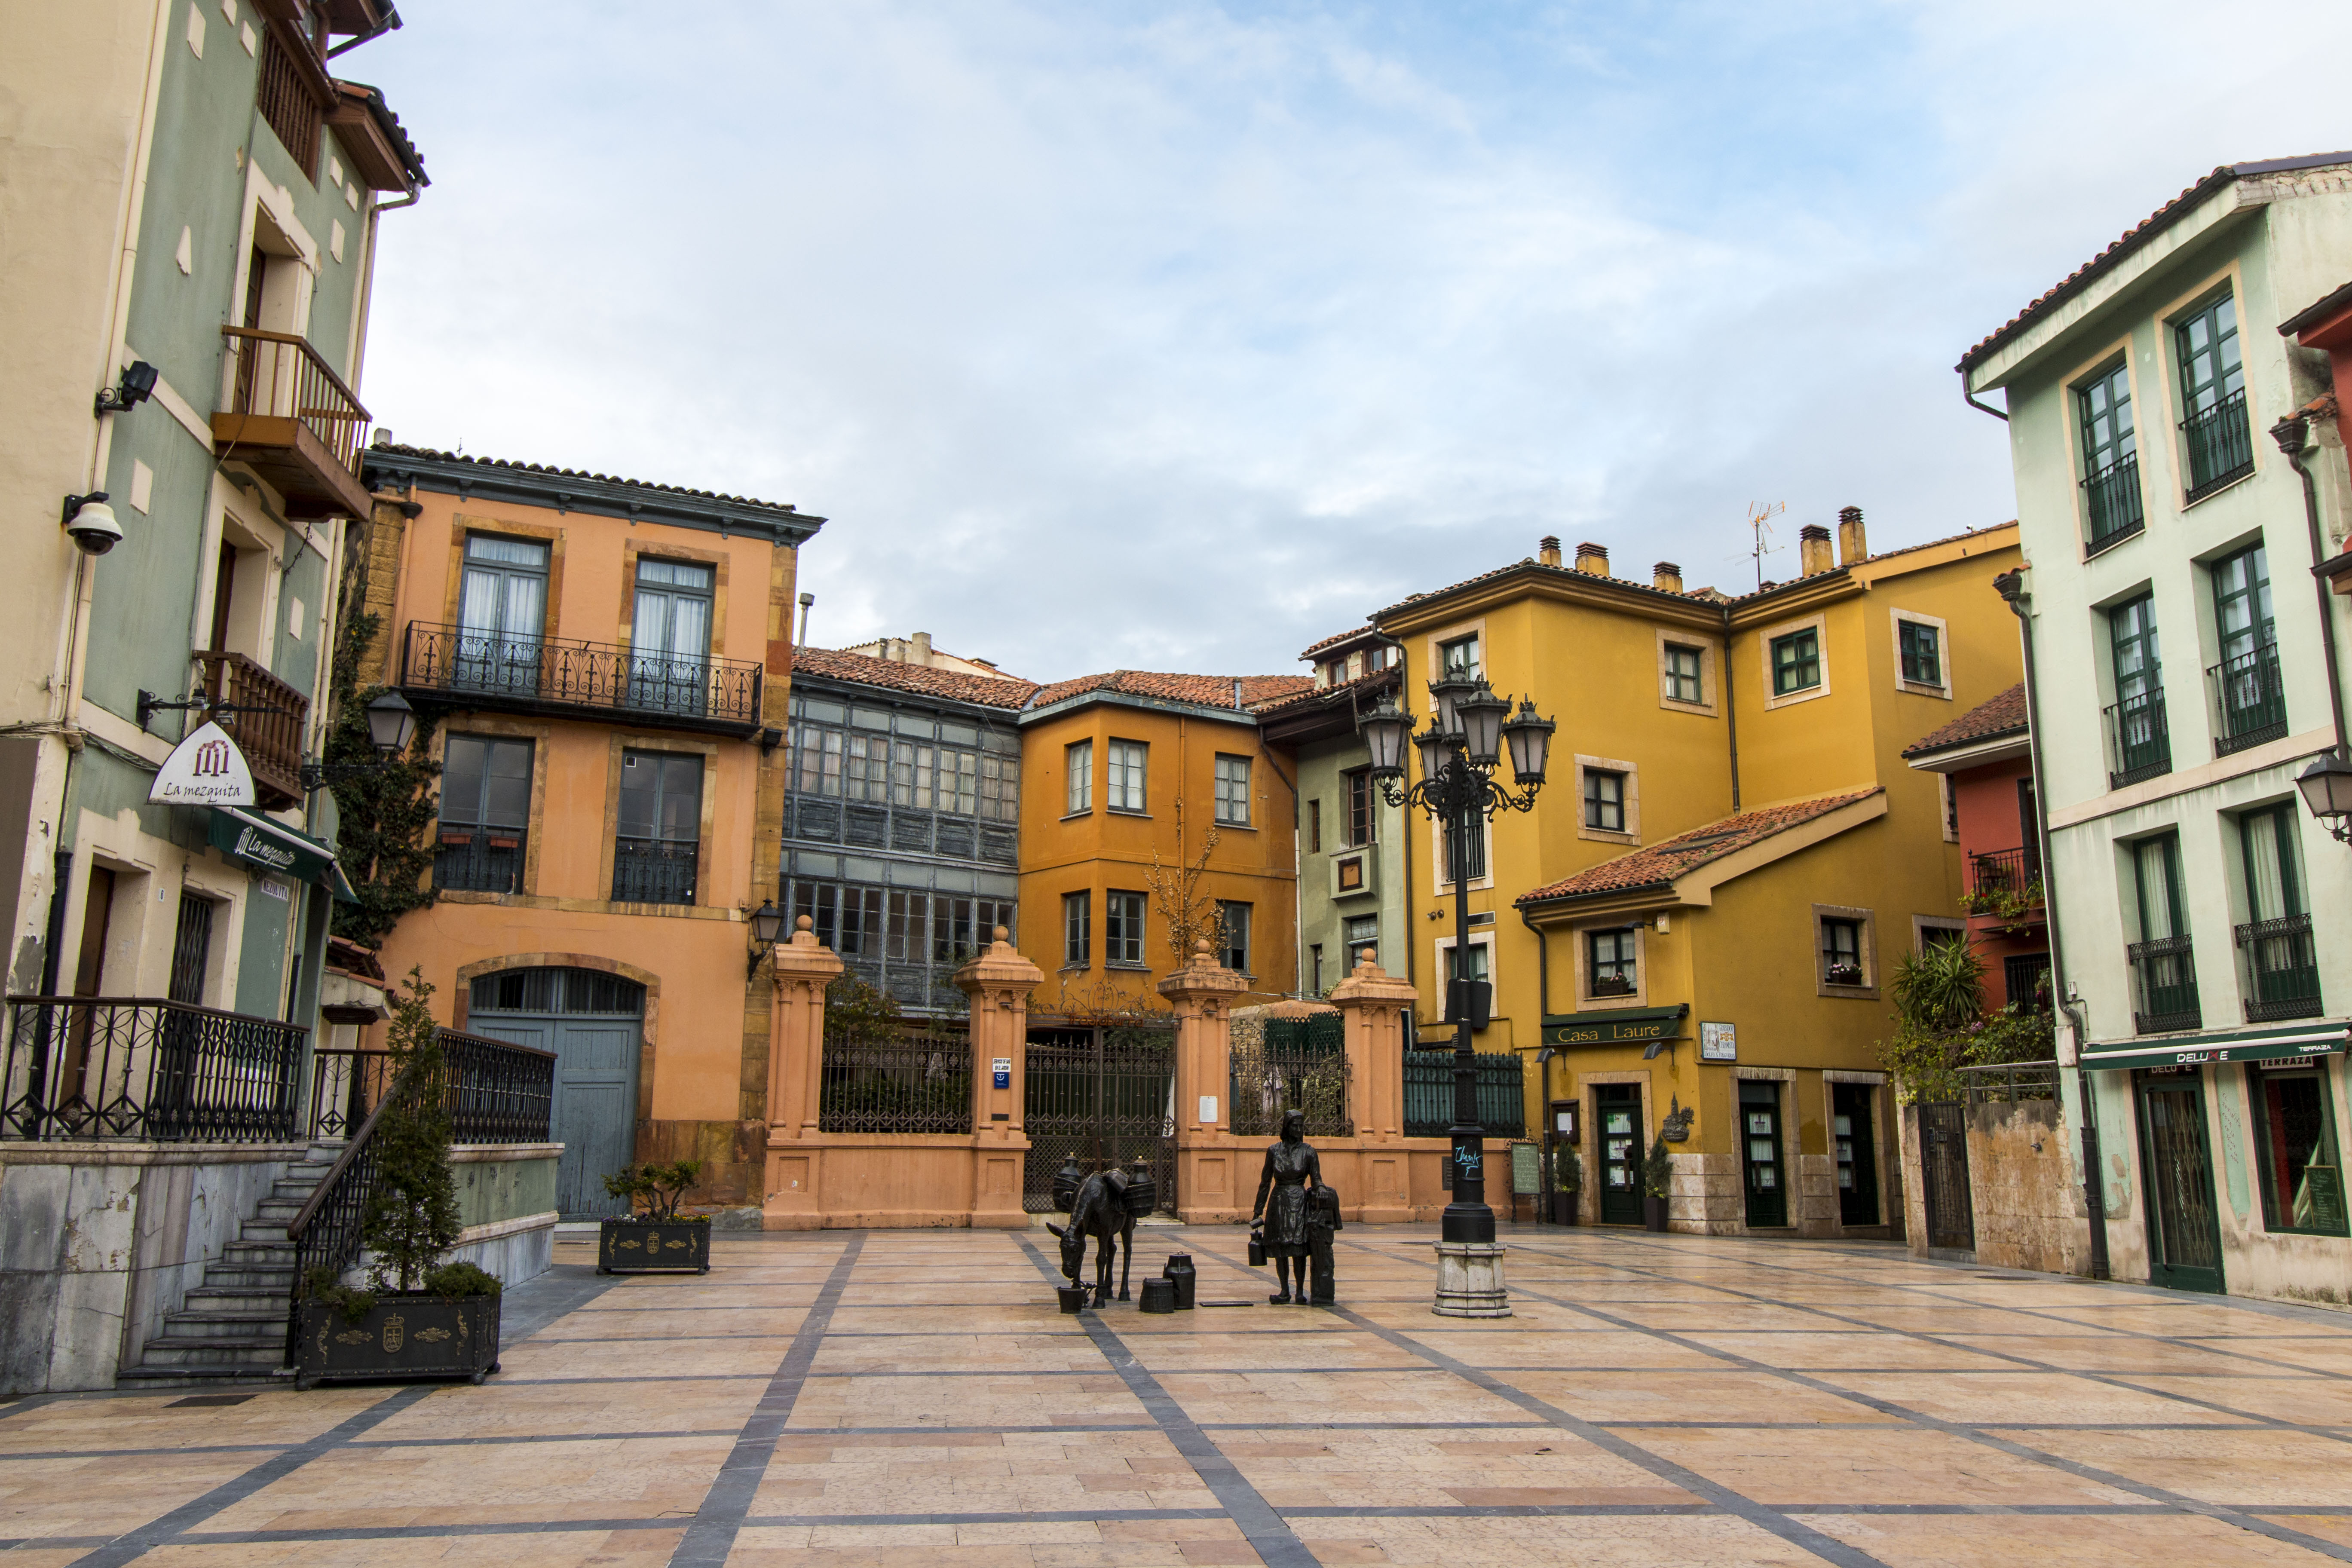 Ruta por Asturias en coche 4 dias